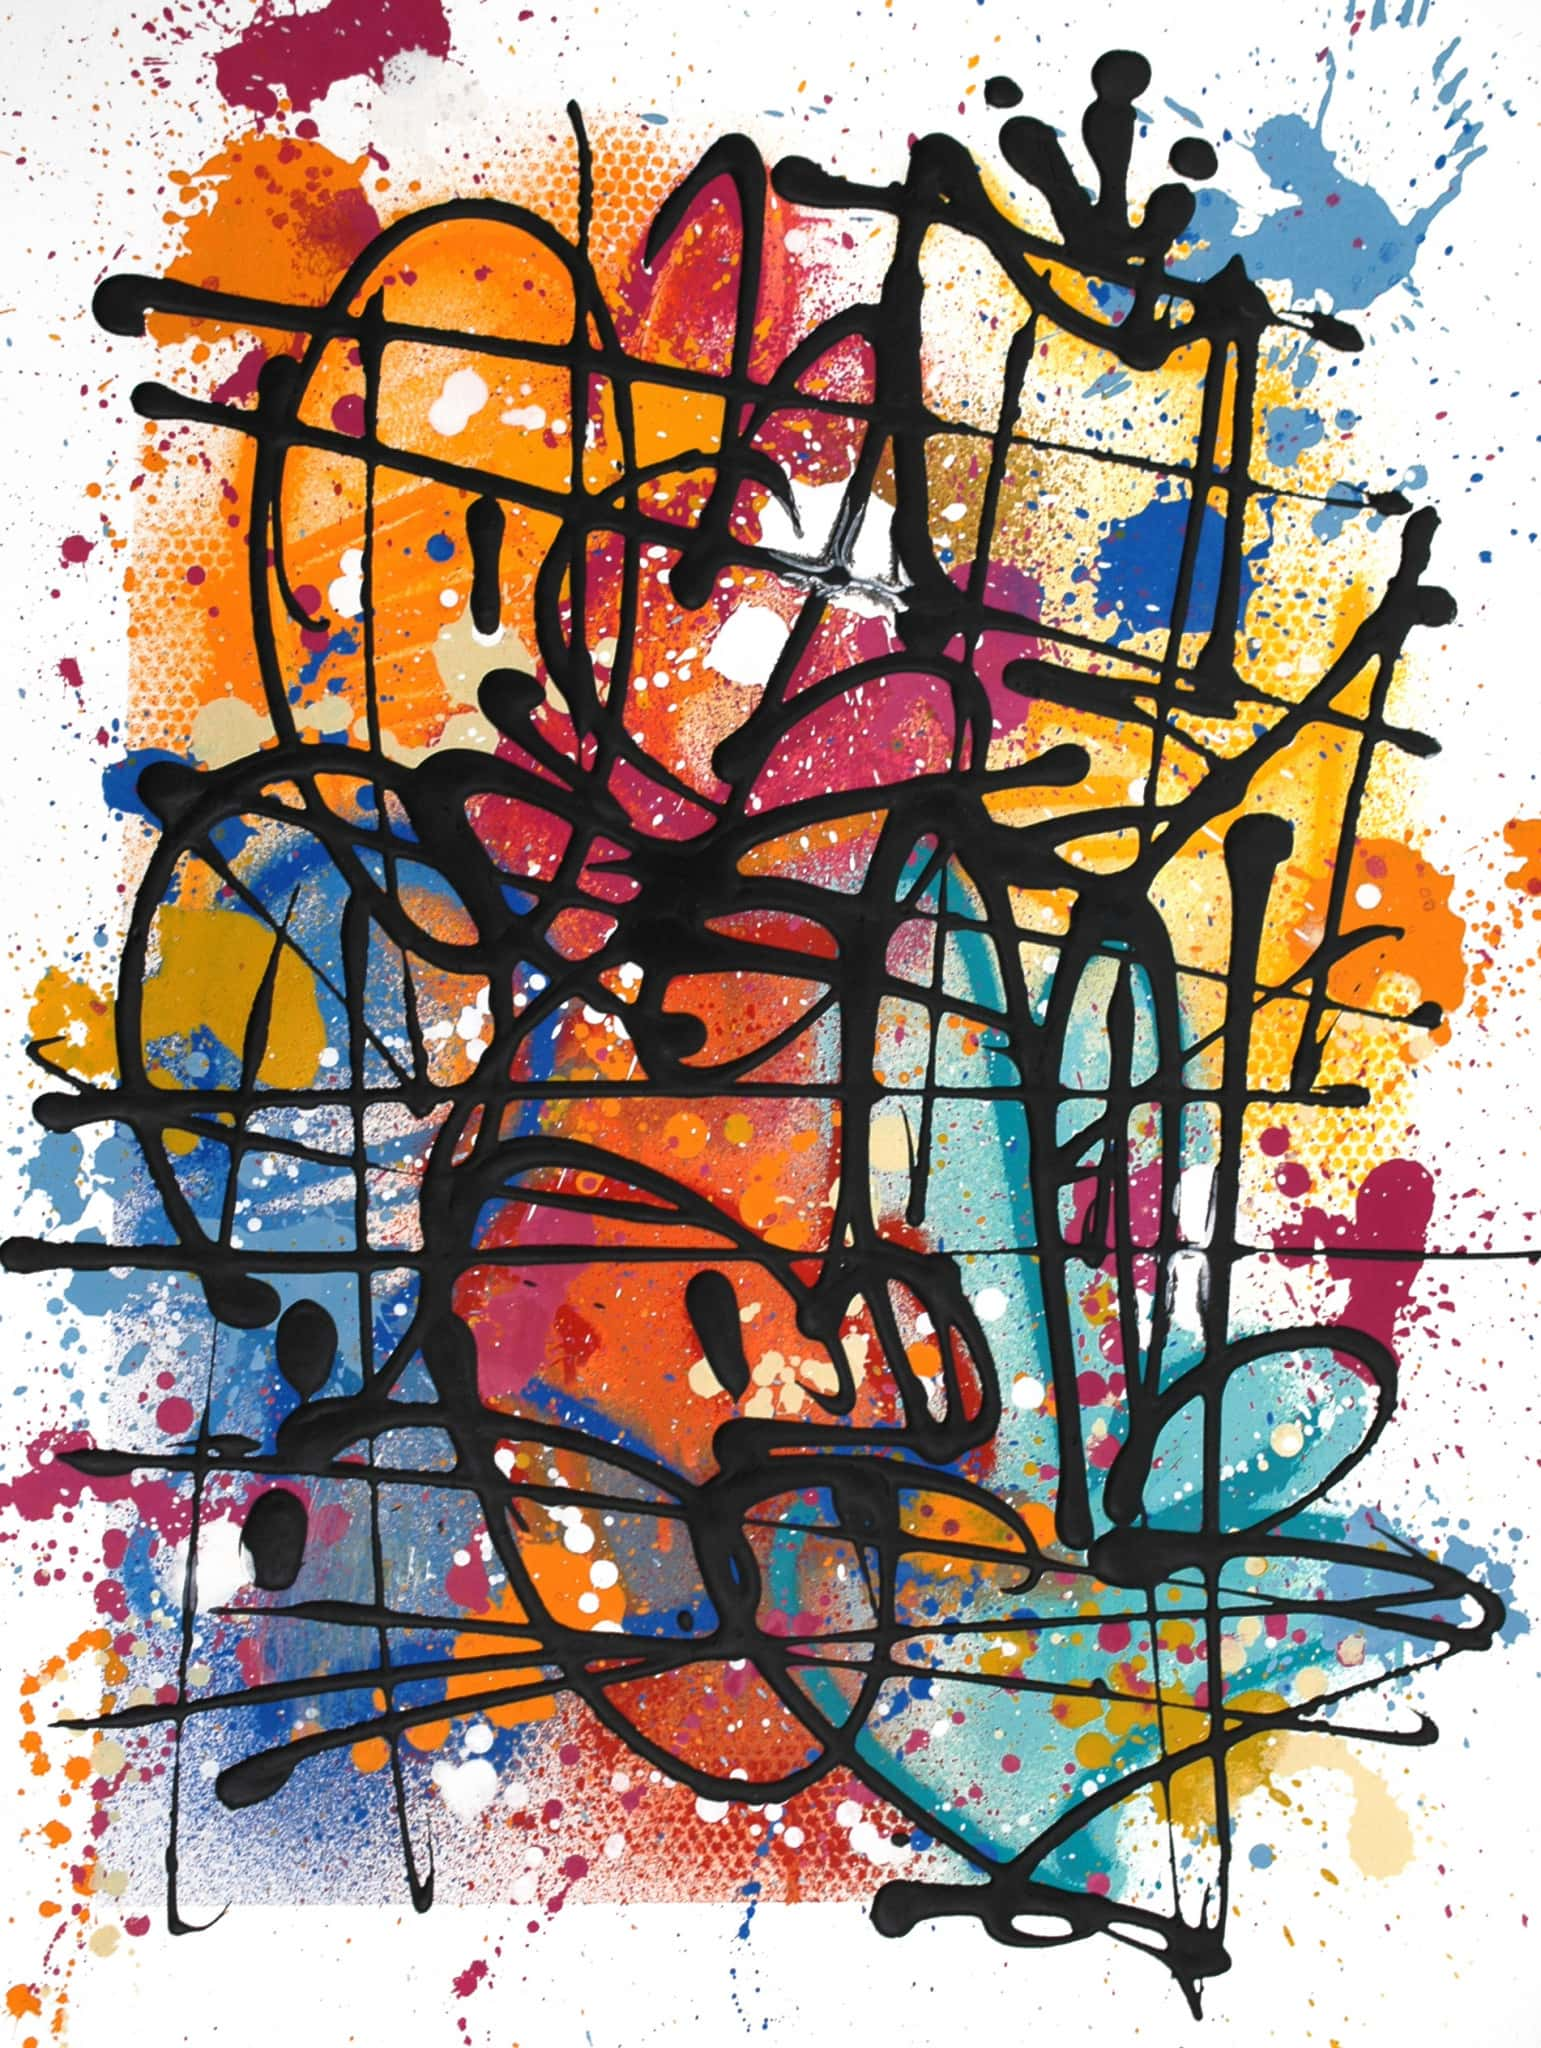 Galerie Art Jingle NEBAY (Réf. NB04) 65x50 cm 2021